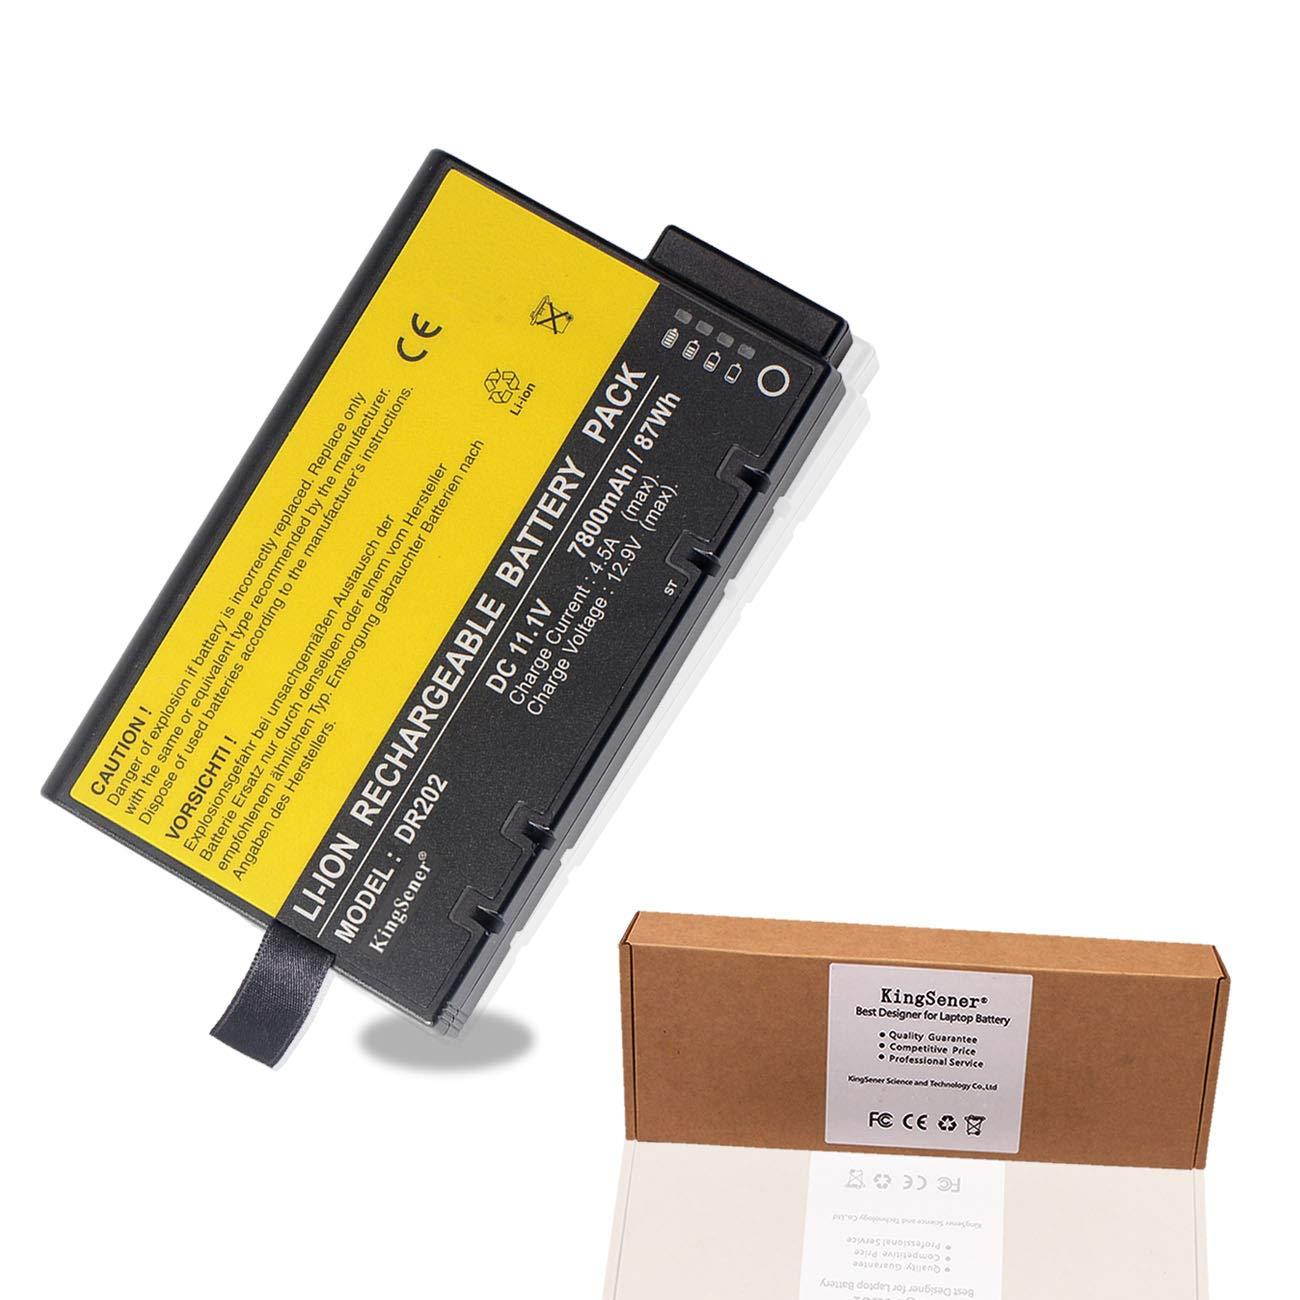 Bateria DR202 para Getac BP-LP2900 33-01PI BP-LC2600 32-01PI